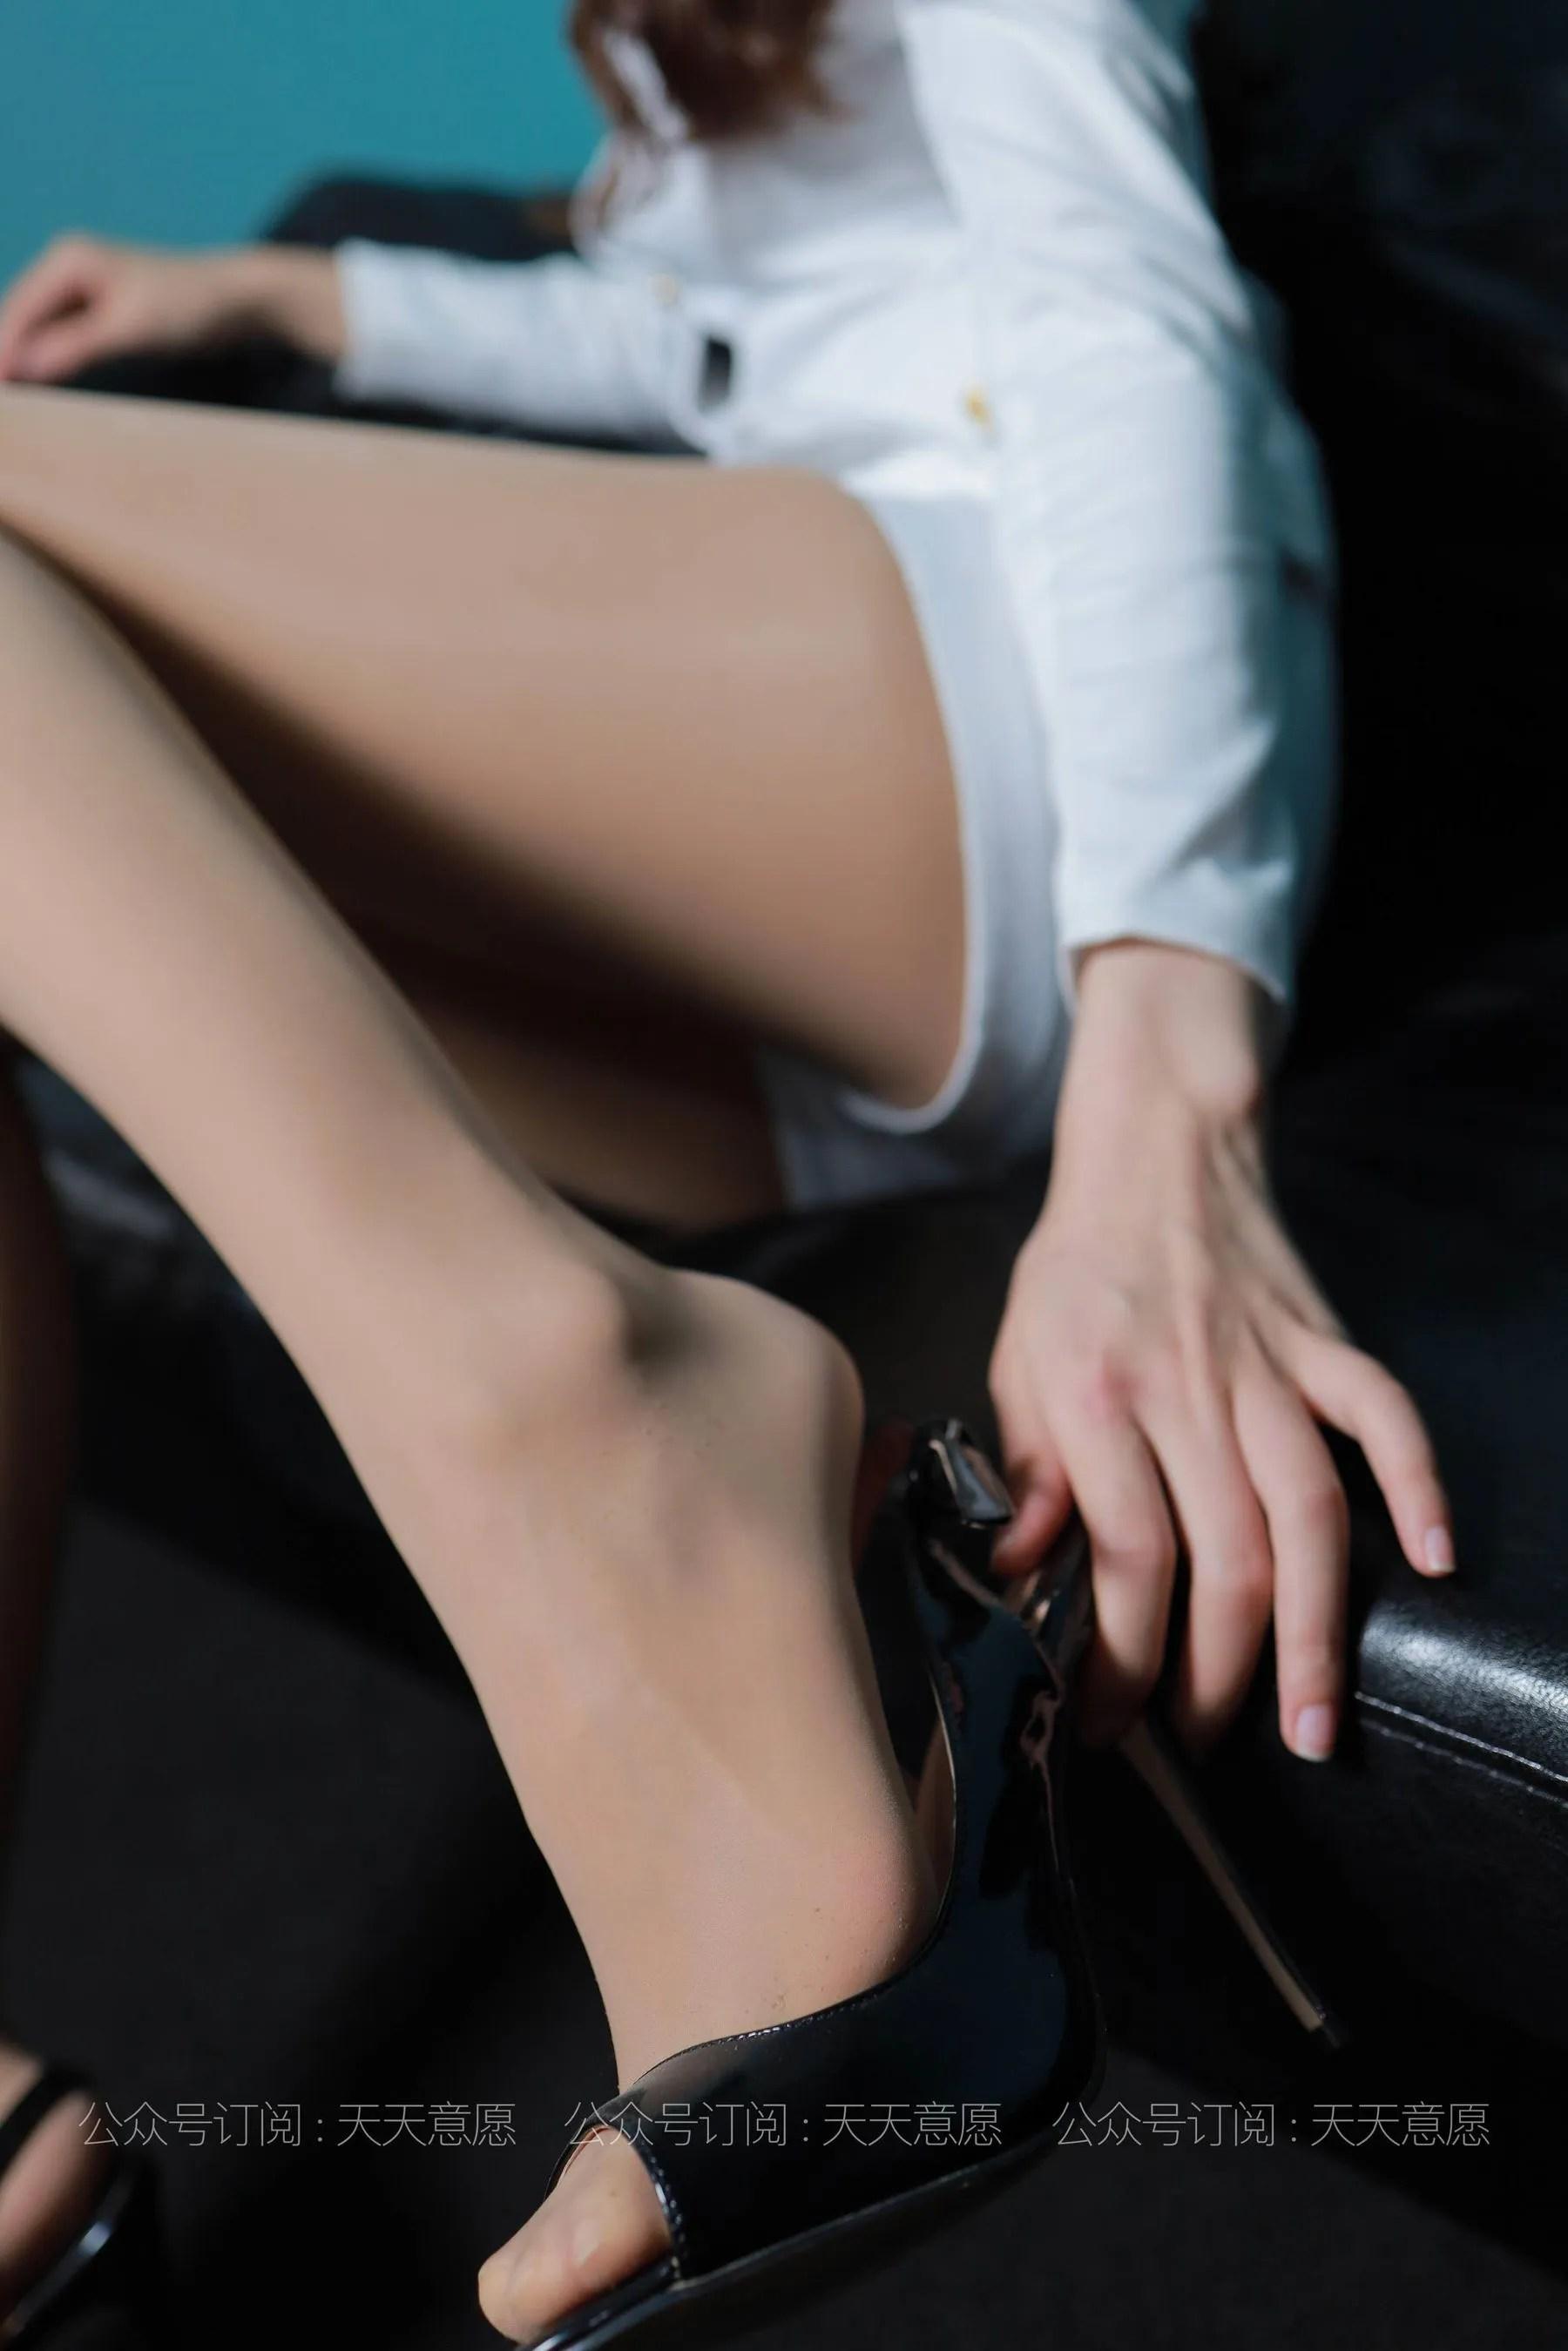 [IESS] 丝享家 768 肉肉《肉肉的白加黑》 丝袜美腿写真[79P]插图(7)